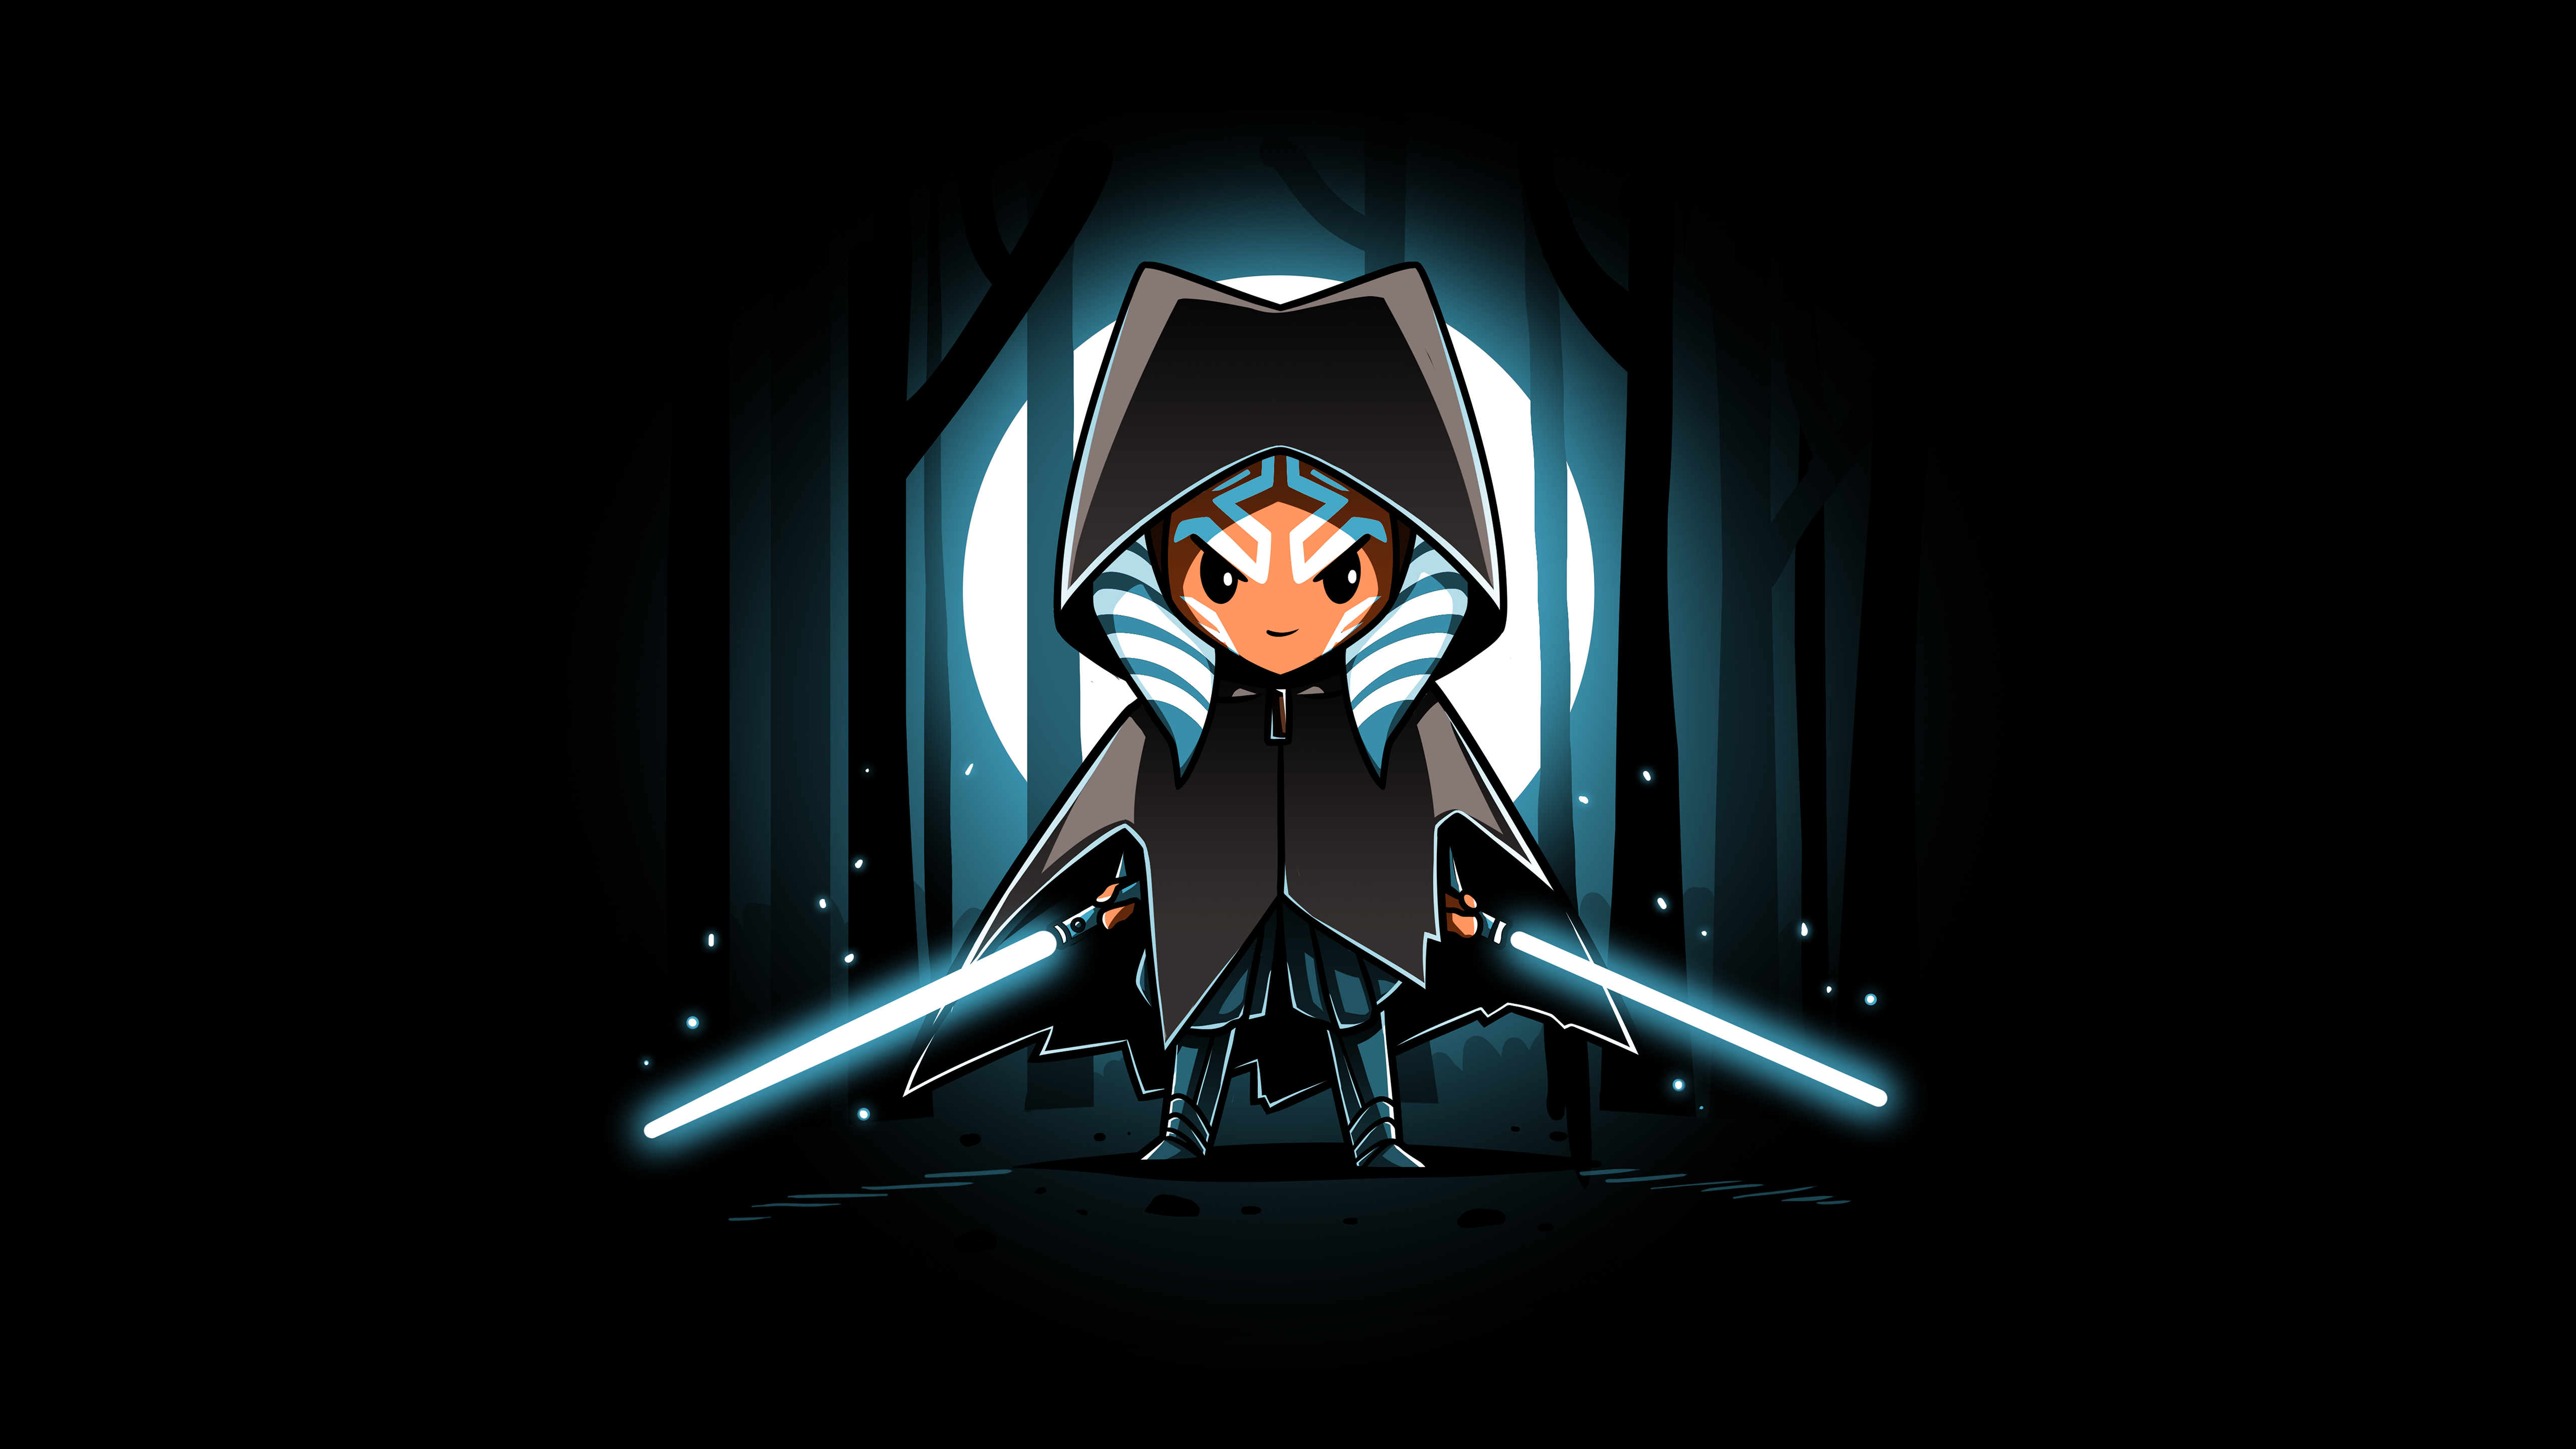 Star Wars Ahsoka Tano Artwork Lightsaber Cloaks Black Background Jedi Minimalism The Mandalorian 5120x2880